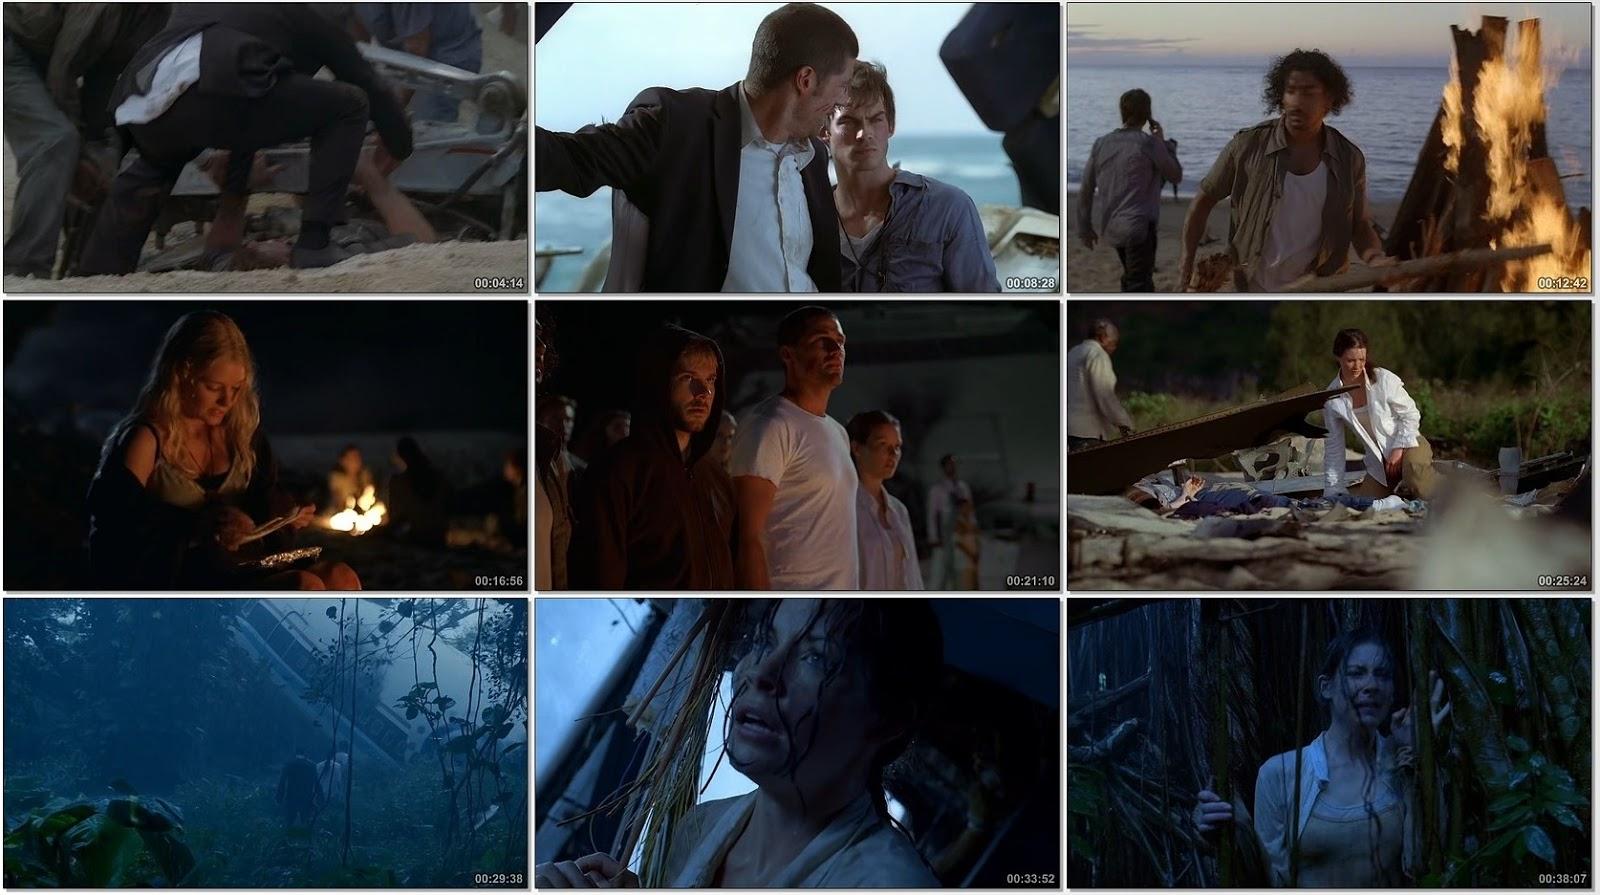 Alt TV Series: Lost Season 2 BluRay 720p x264 250MB - KumpulBagi